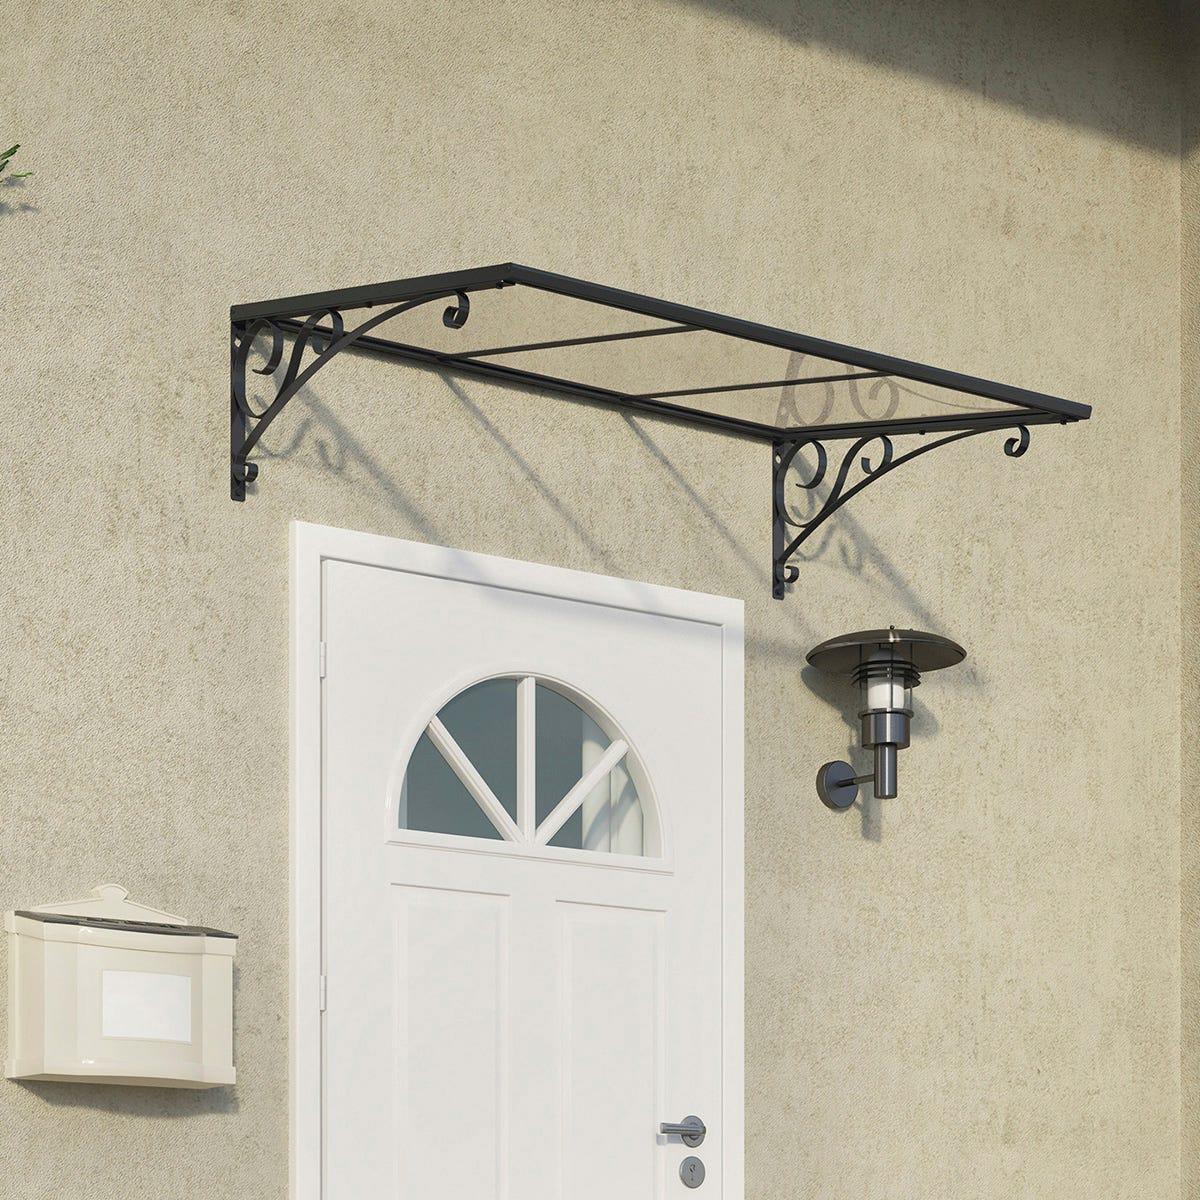 Palram - Canopia Venus Door Canopy - Grey/Clear